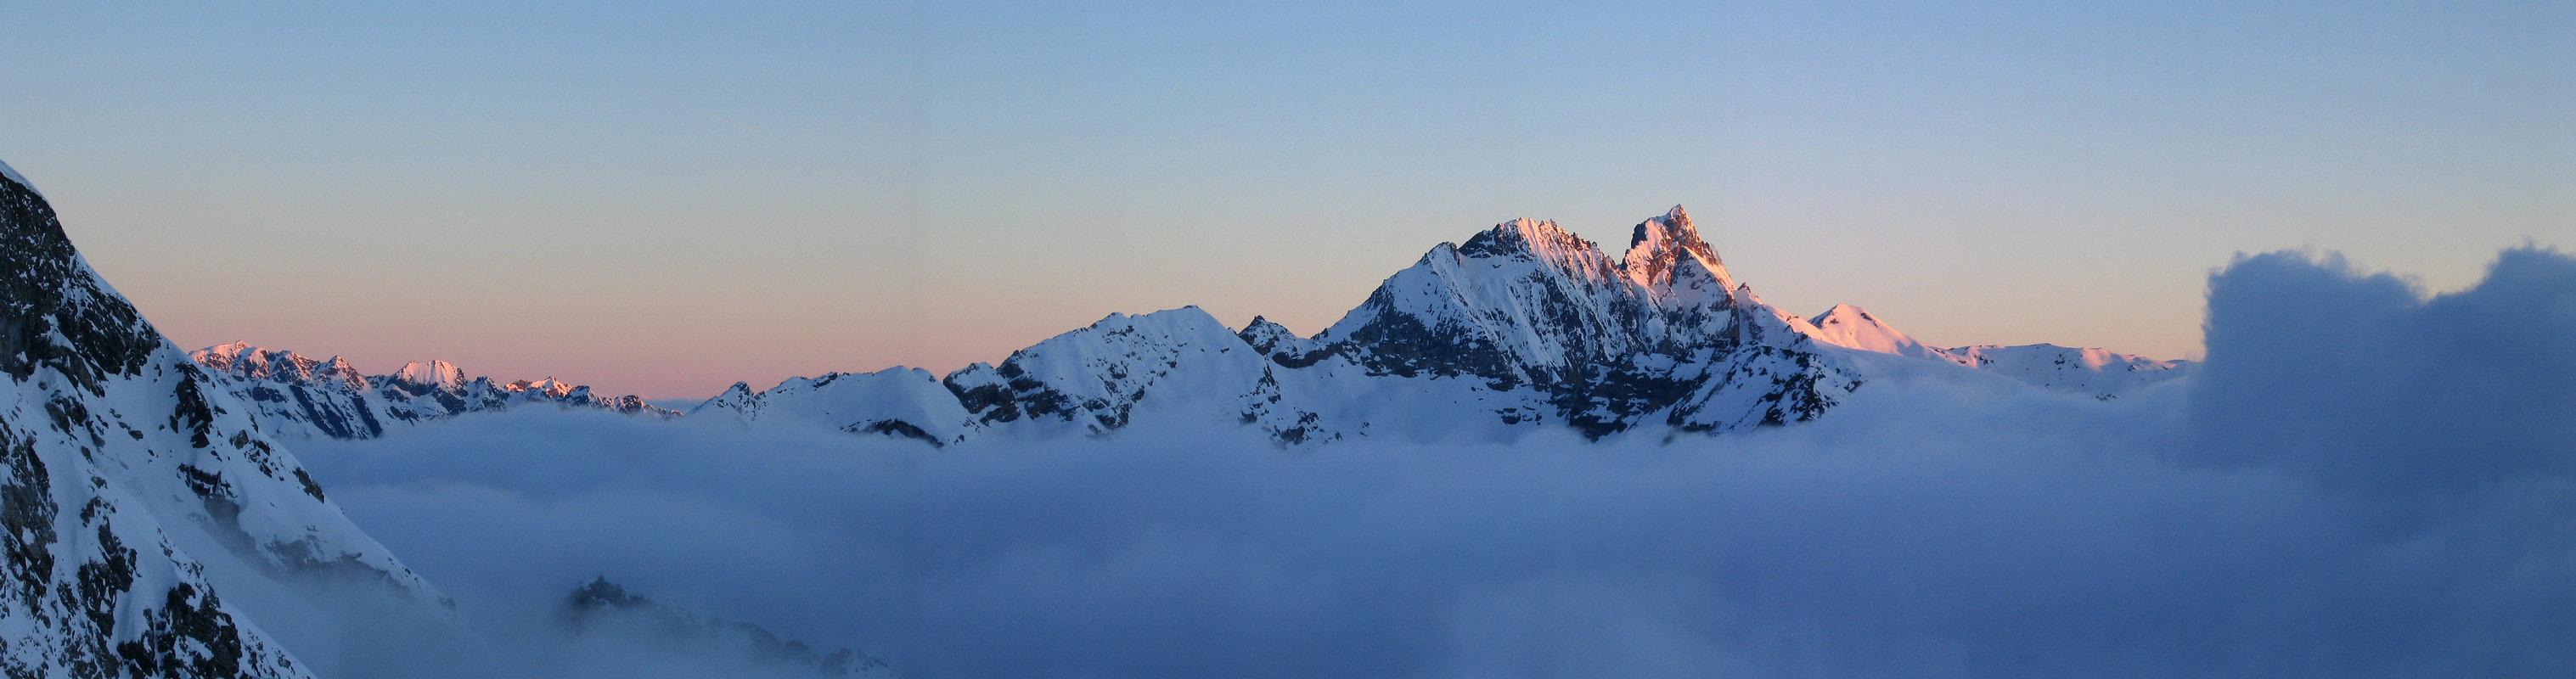 Col Valpelline, Day 6 H.R. Chamonix-Zermatt Walliser Alpen / Alpes valaisannes Švýcarsko panorama 13